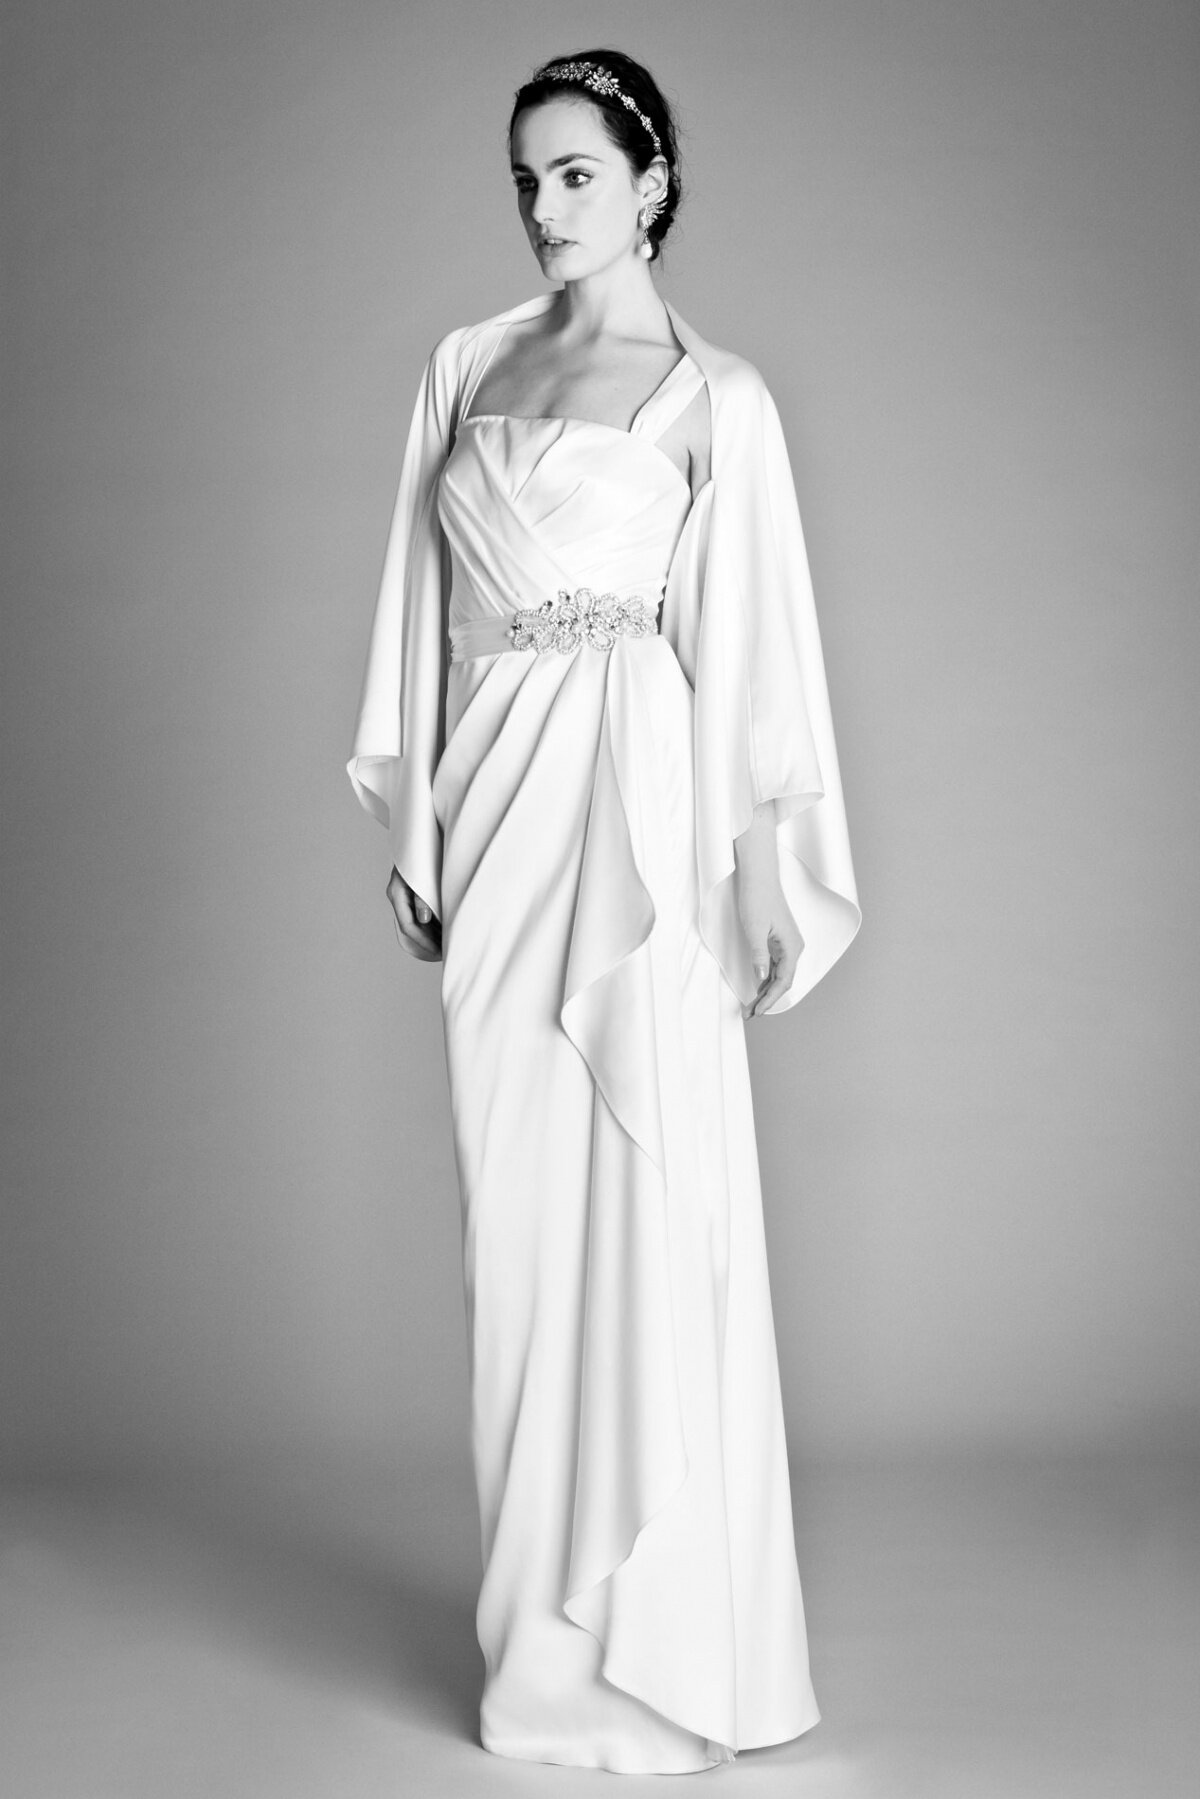 Wedding dresses for second time brides pictures ideas for Wedding dresses second time brides